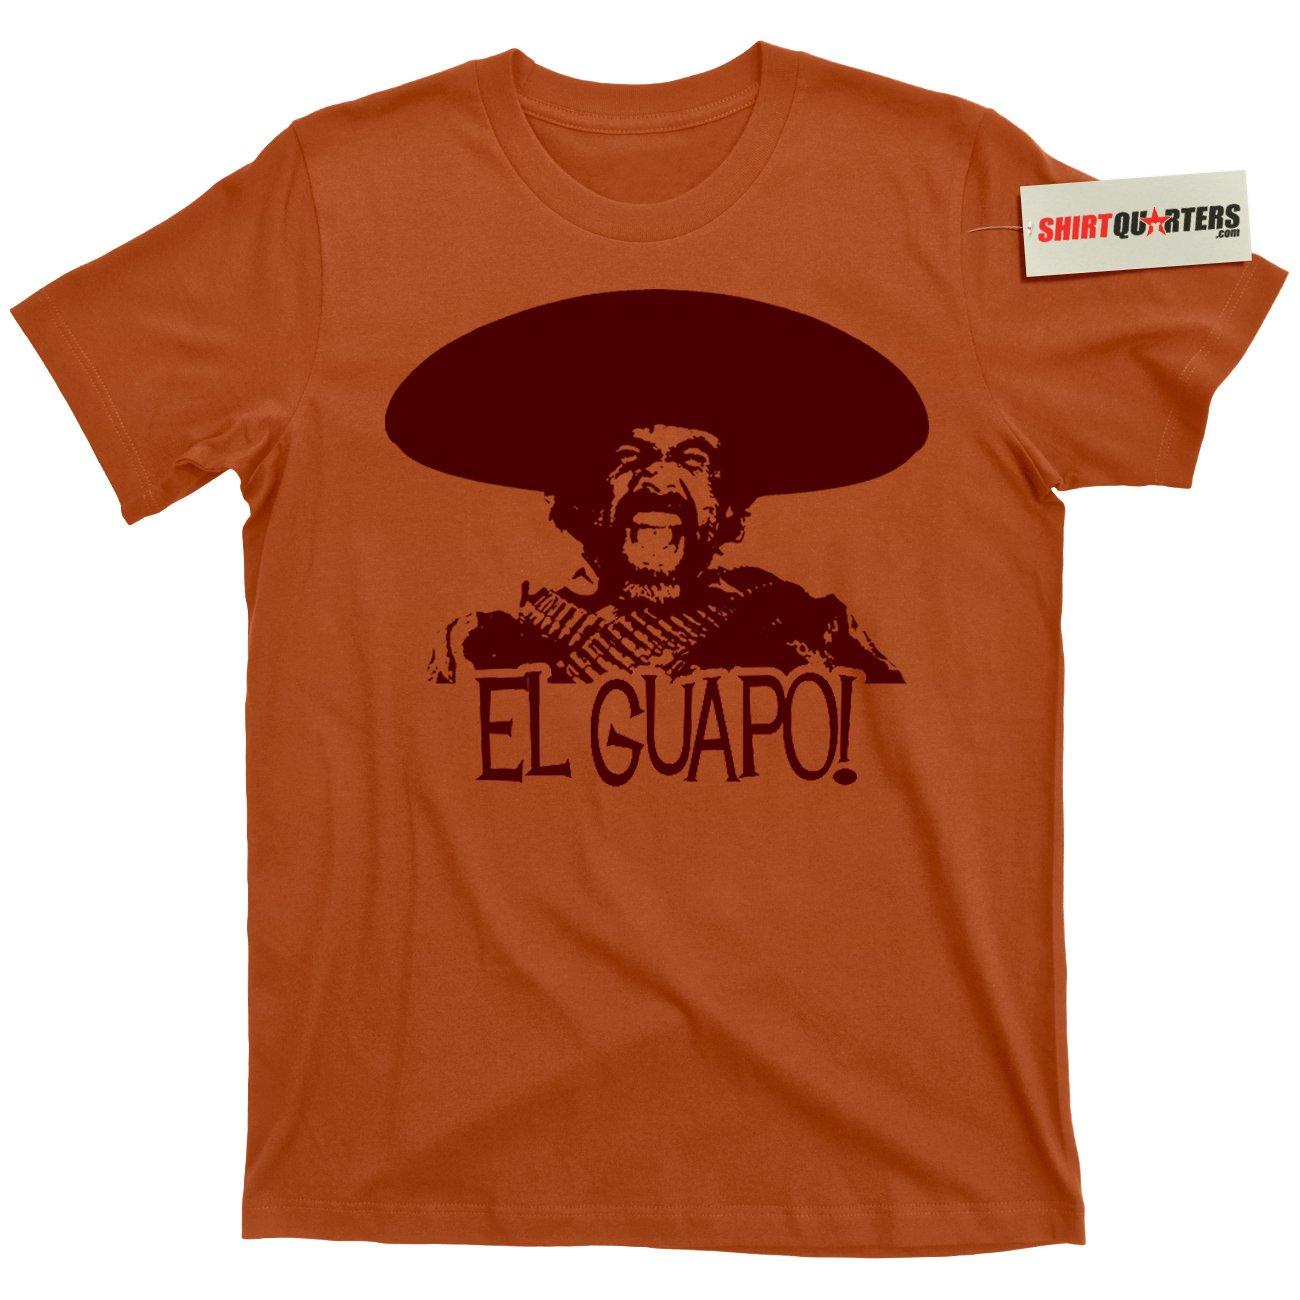 3a451fb4 El Guapo Three Amigos Eighties Funny Villain Outlaw Its a Sweater Tee T  Shirt | Amazon.com